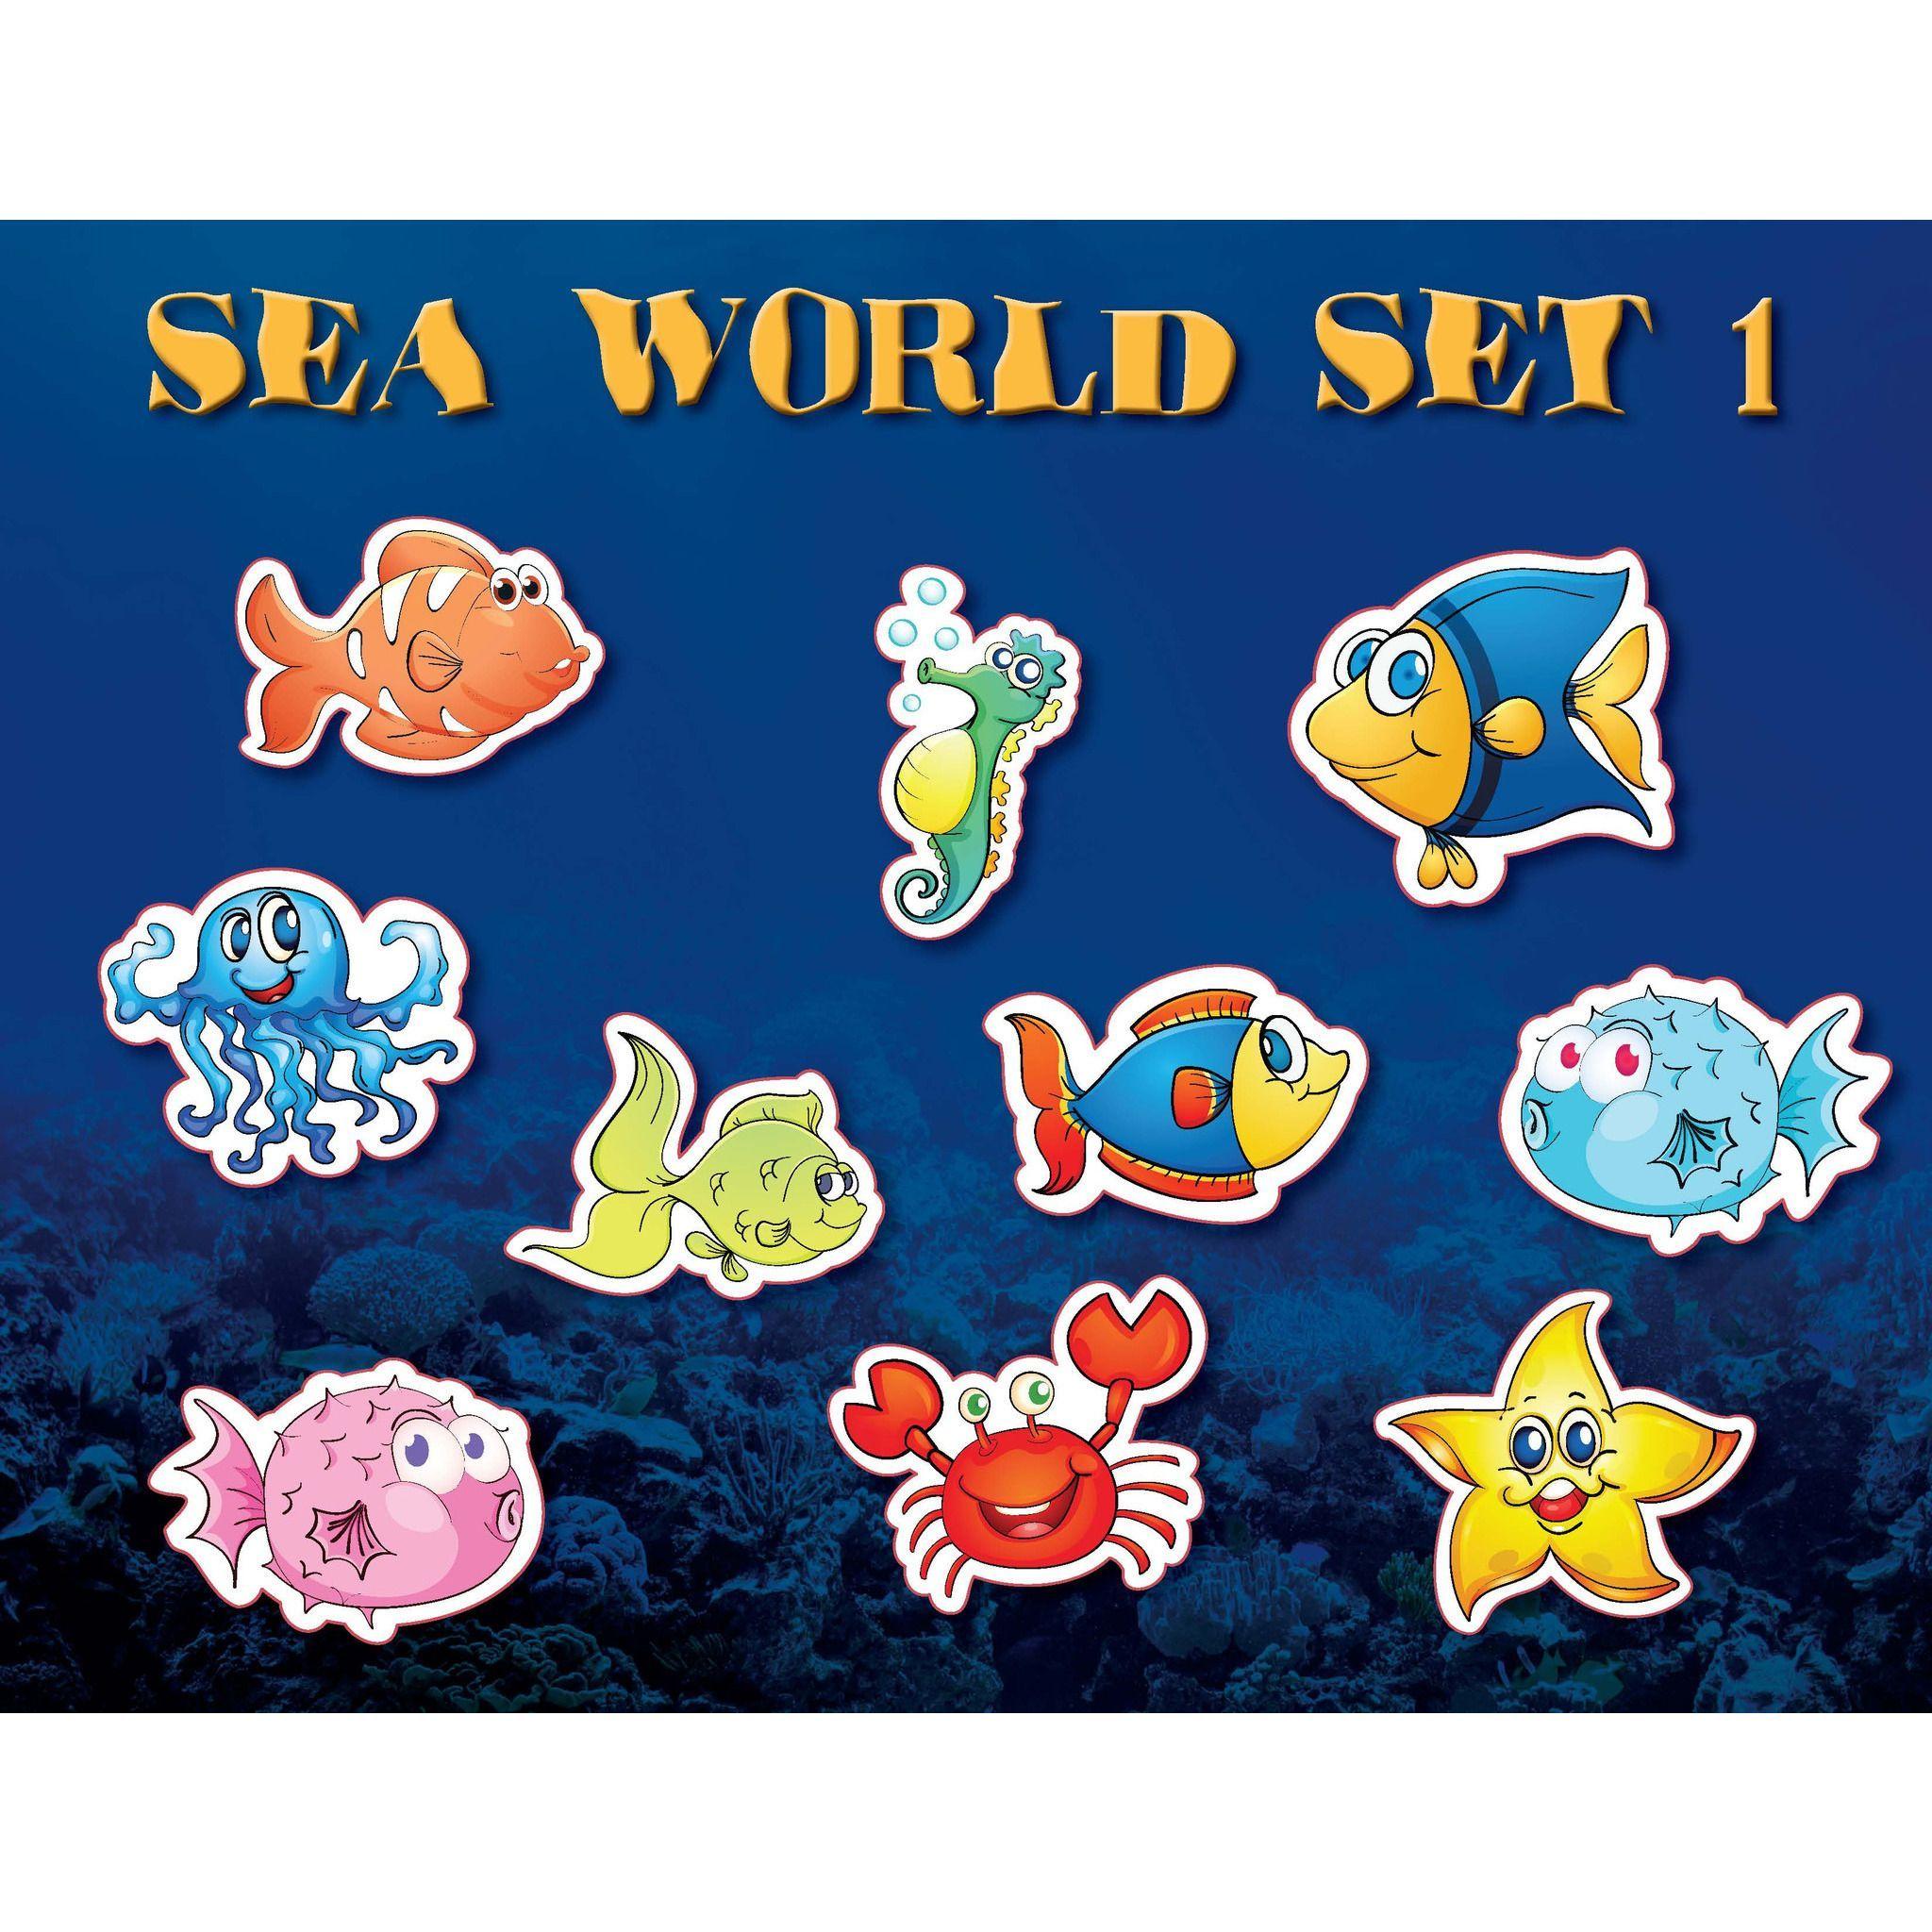 Wall 2 Wall Stickers Sea World Set 1 Fish Water Ocean Underwater Kids Wall